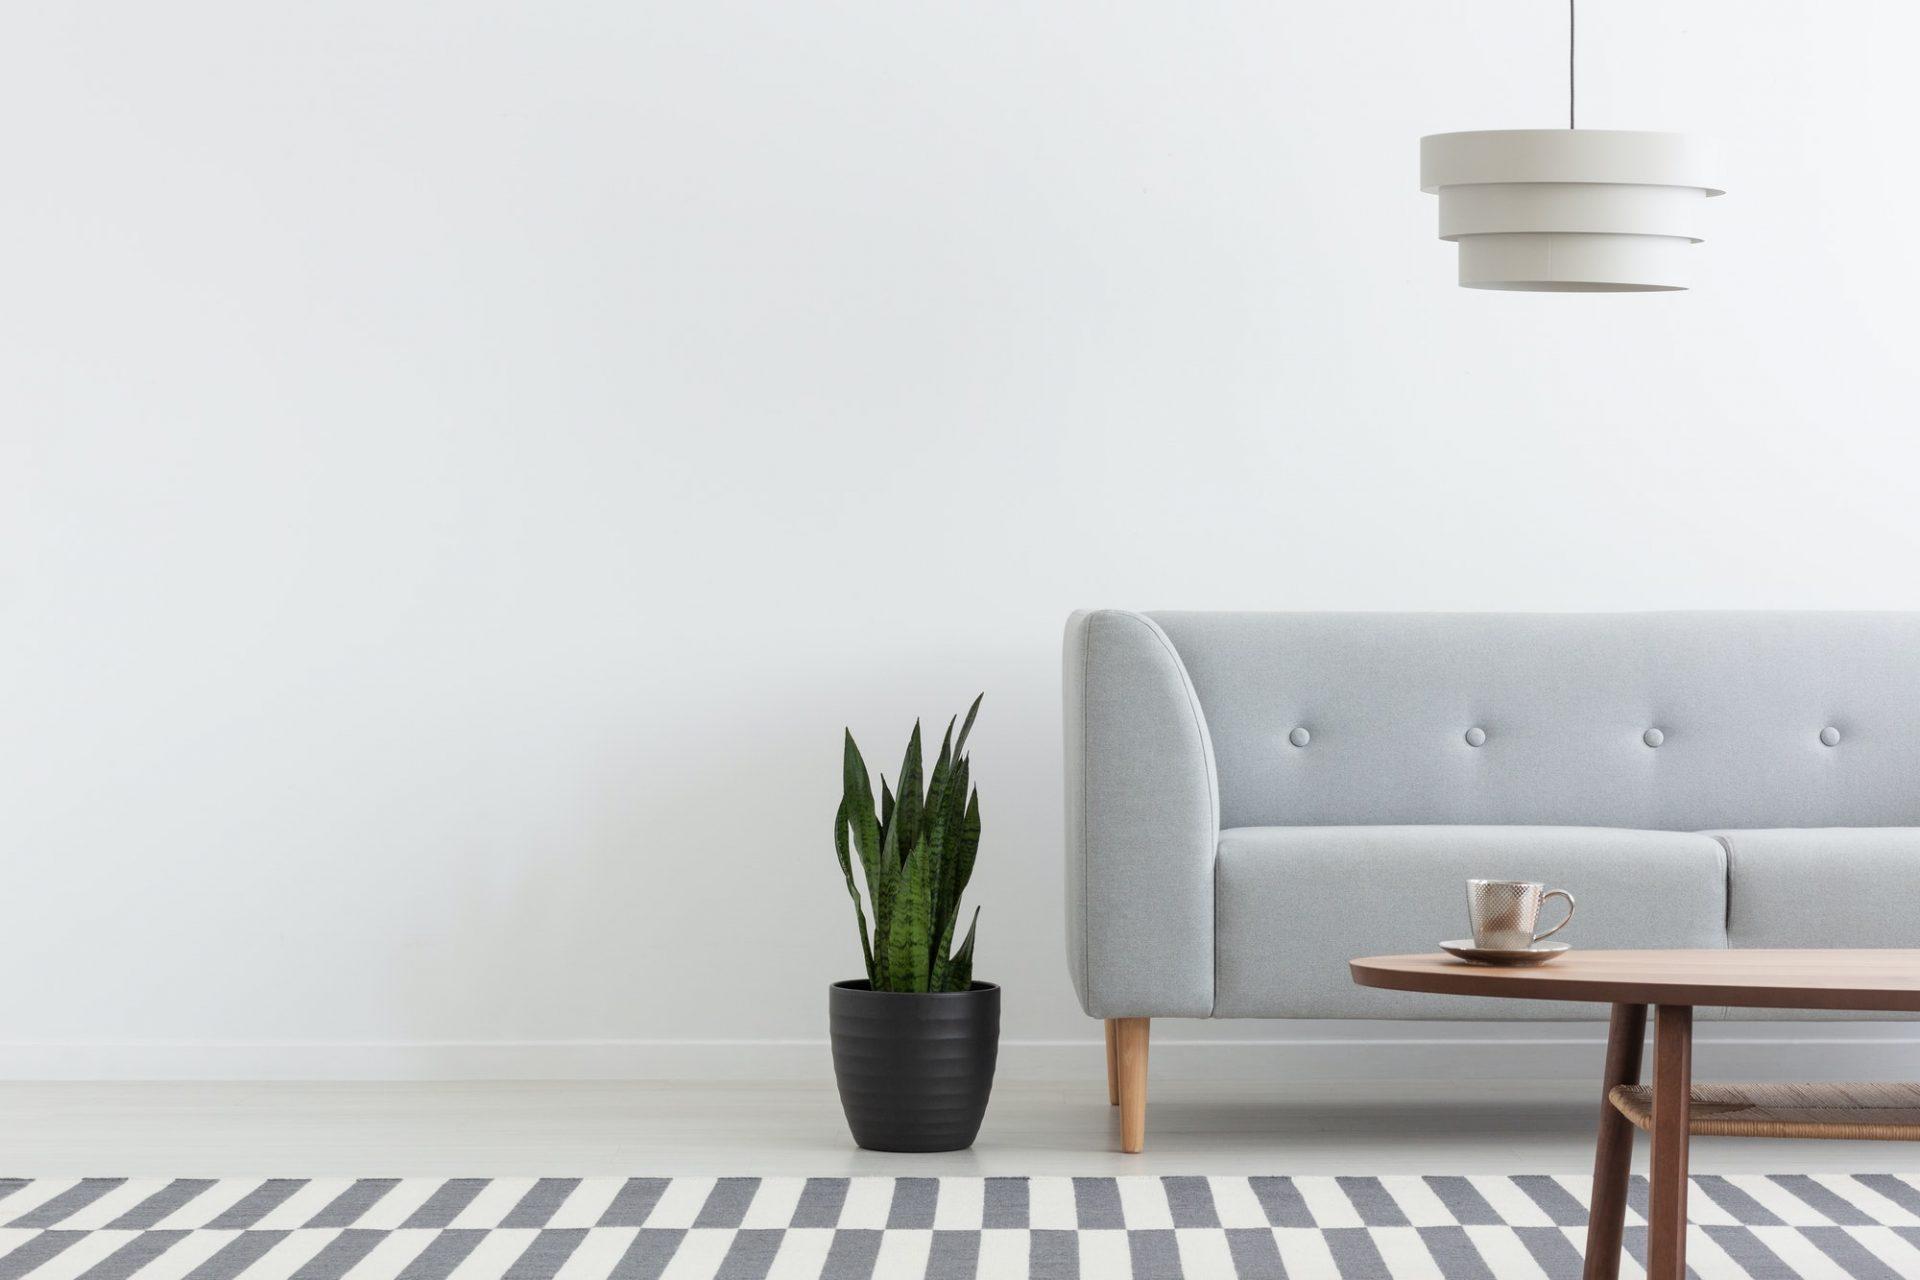 Stylish lamp above grey modern sofa in white living room interio